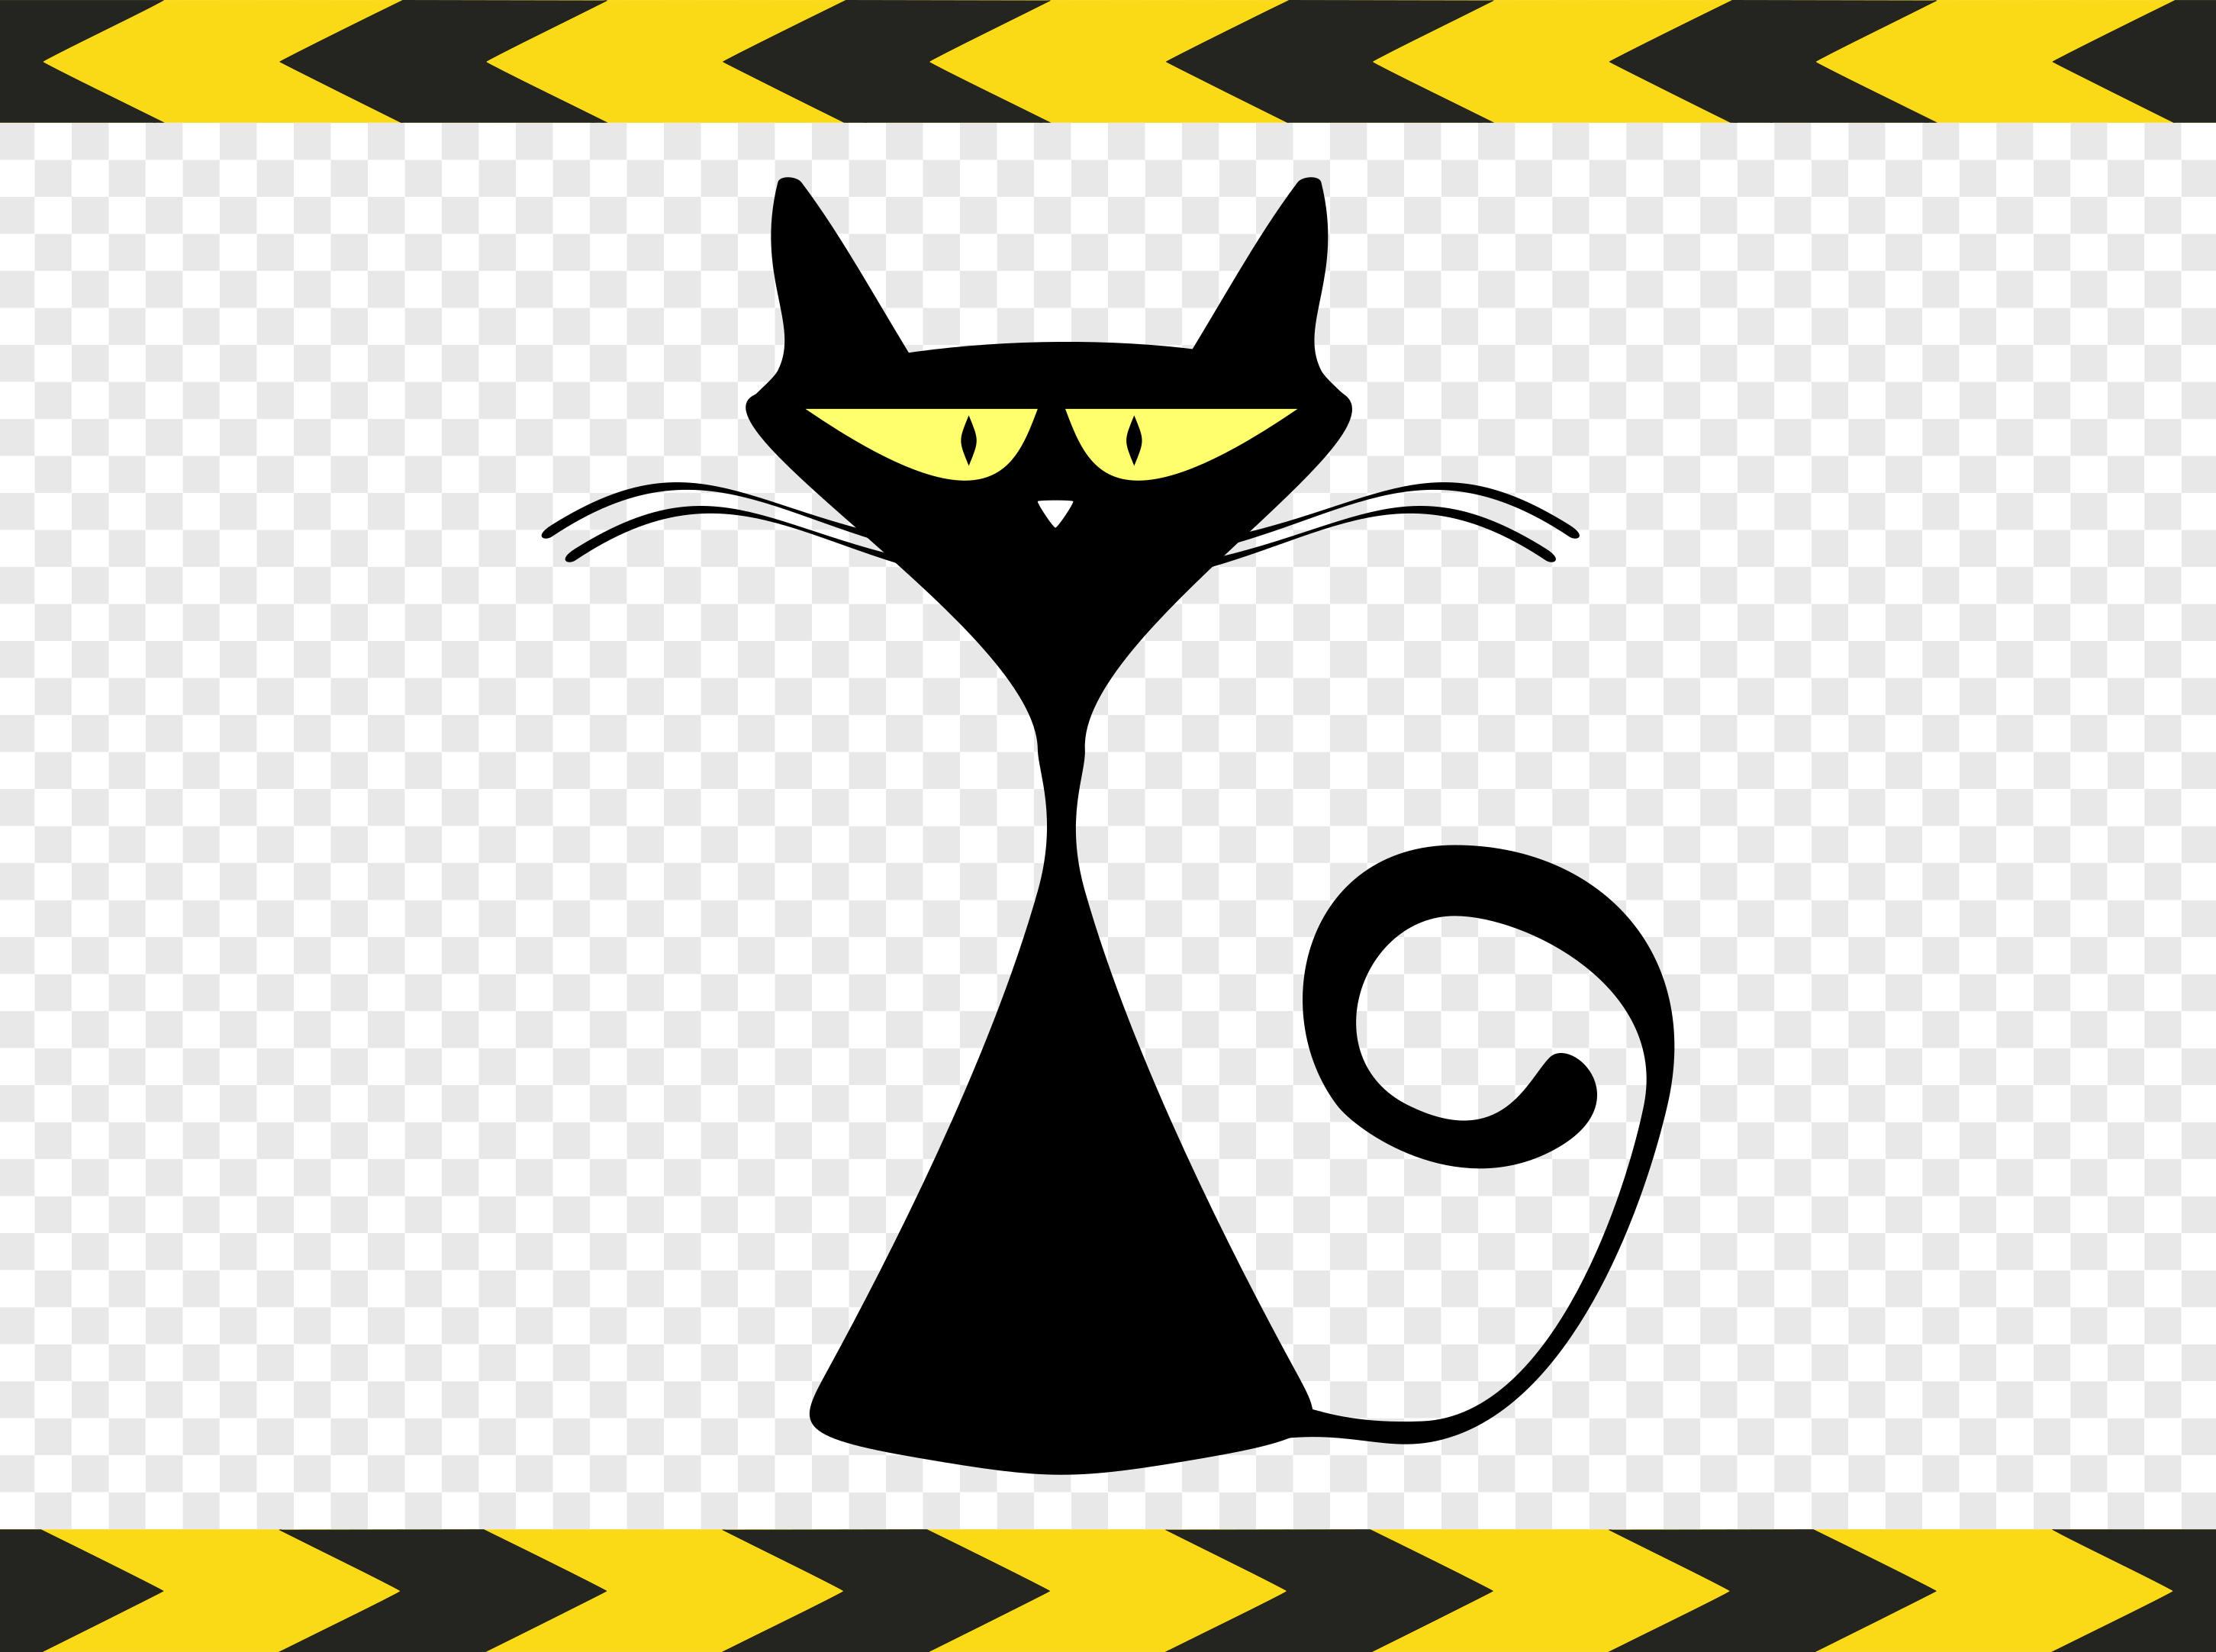 Cat Svg Vector Decal Shirt Car Stickers Clipart Scrapbook Dxf